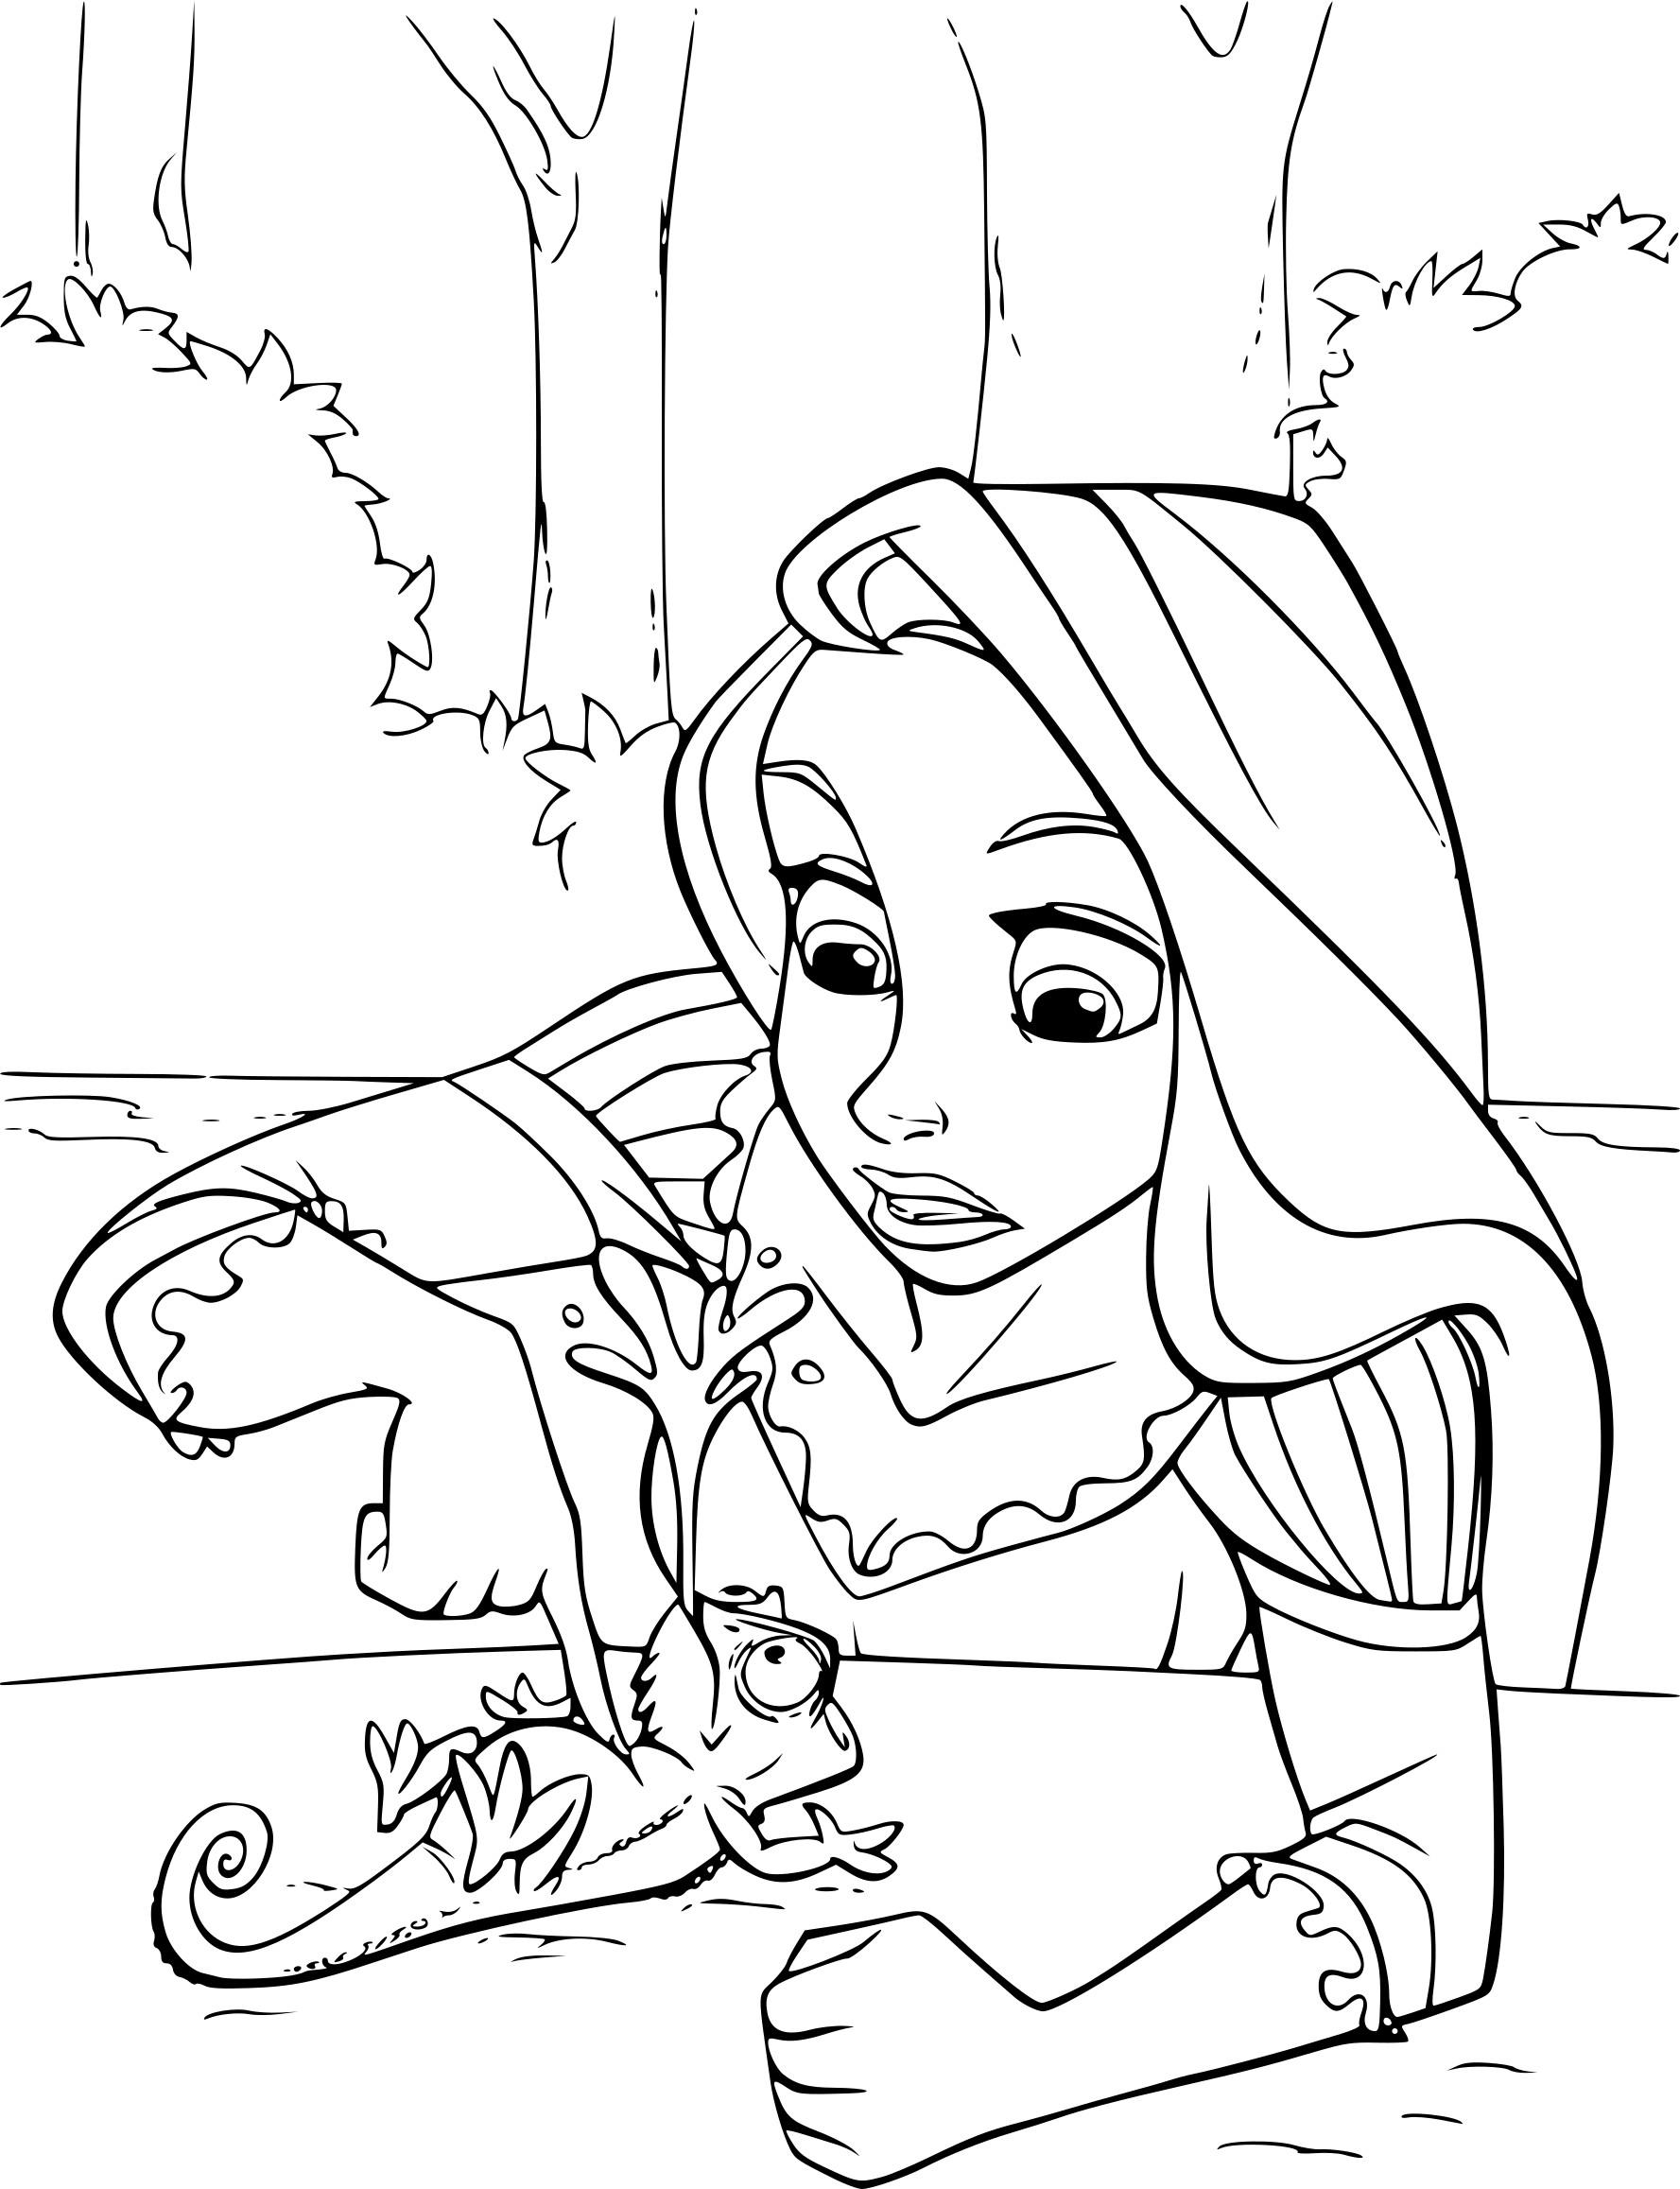 Inspirant Image Princesse Raiponce A Colorier